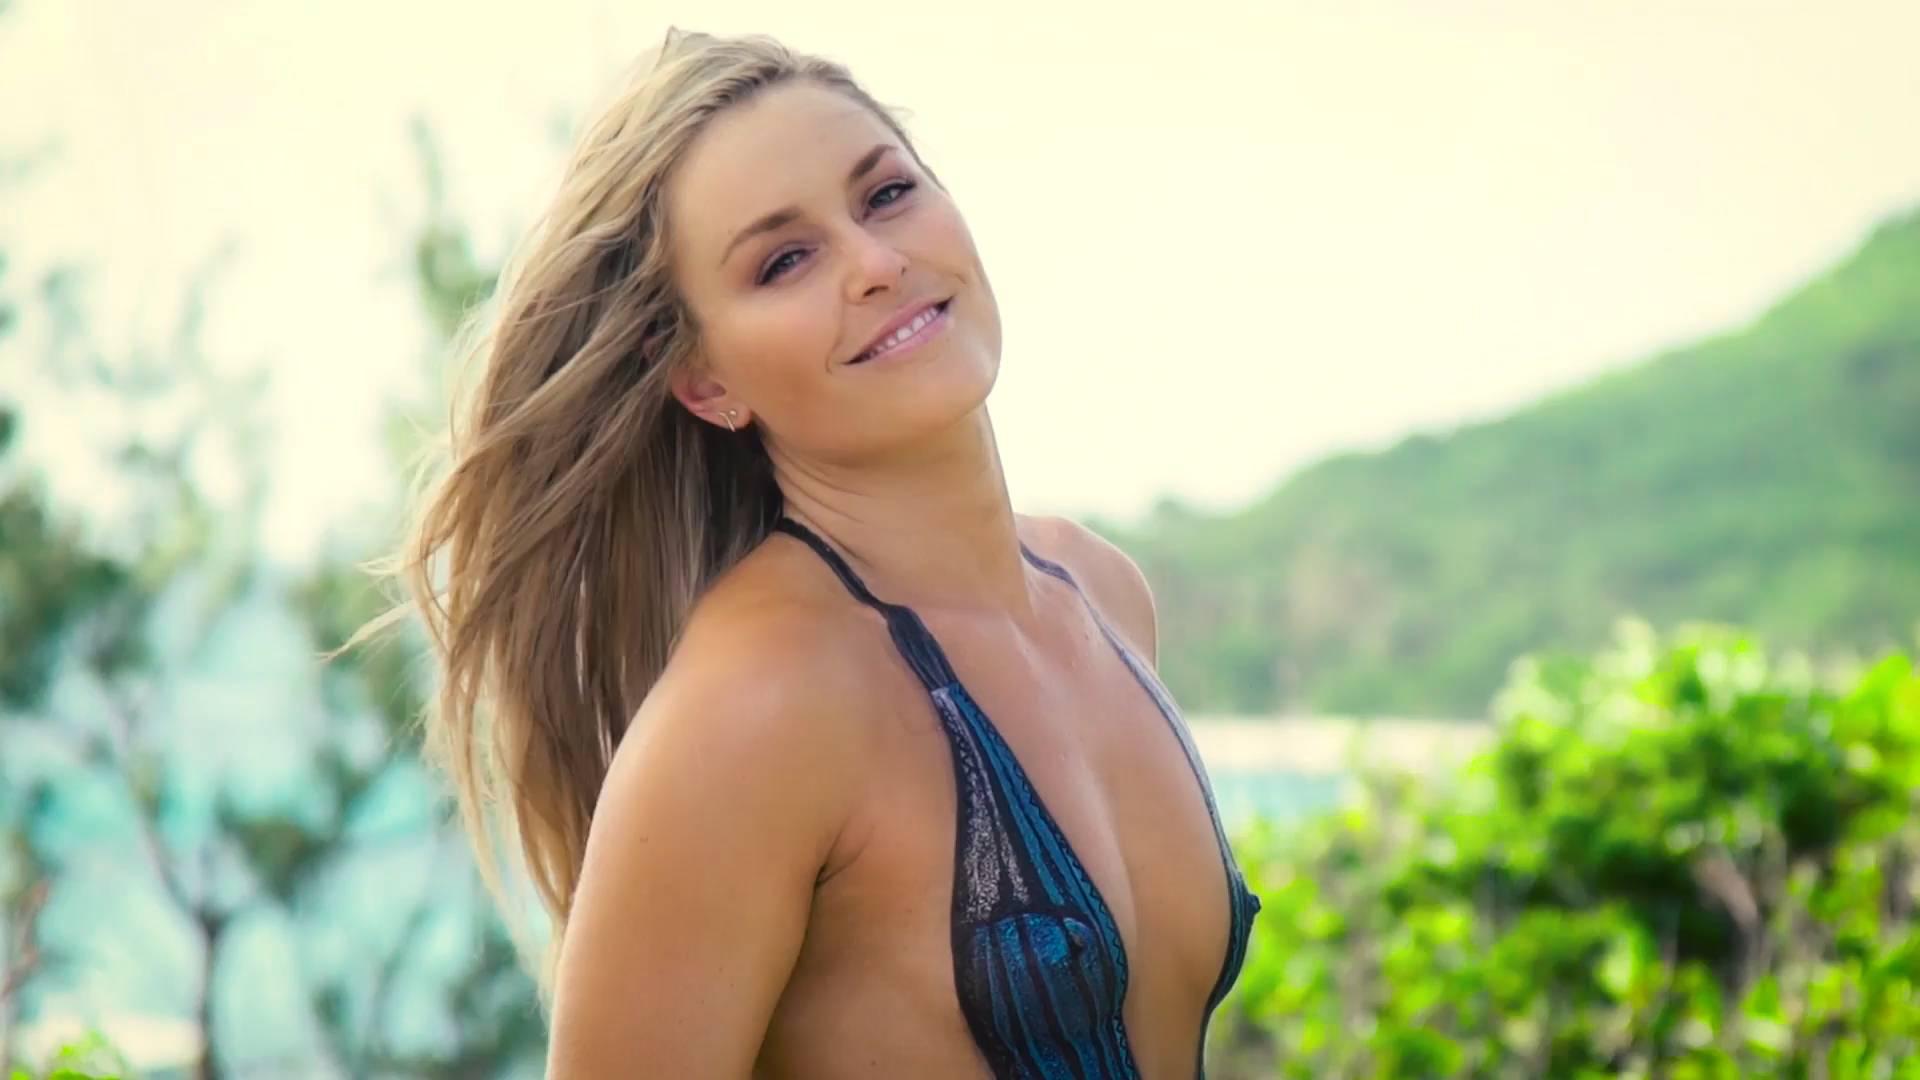 Linsey vonn bikini